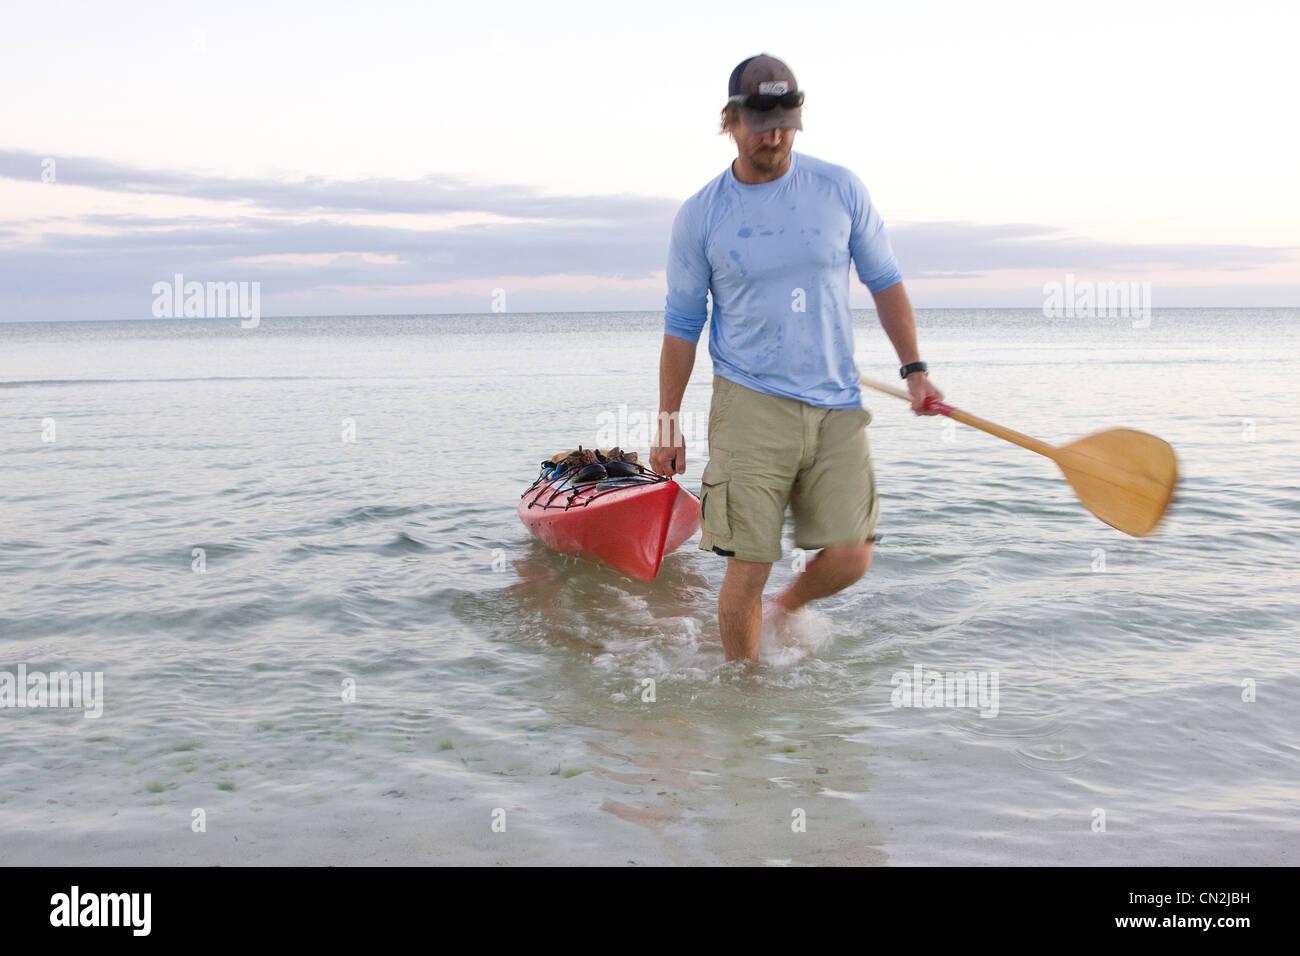 Man Pulling Kayak onto Beach, Florida Keys, USA - Stock Image